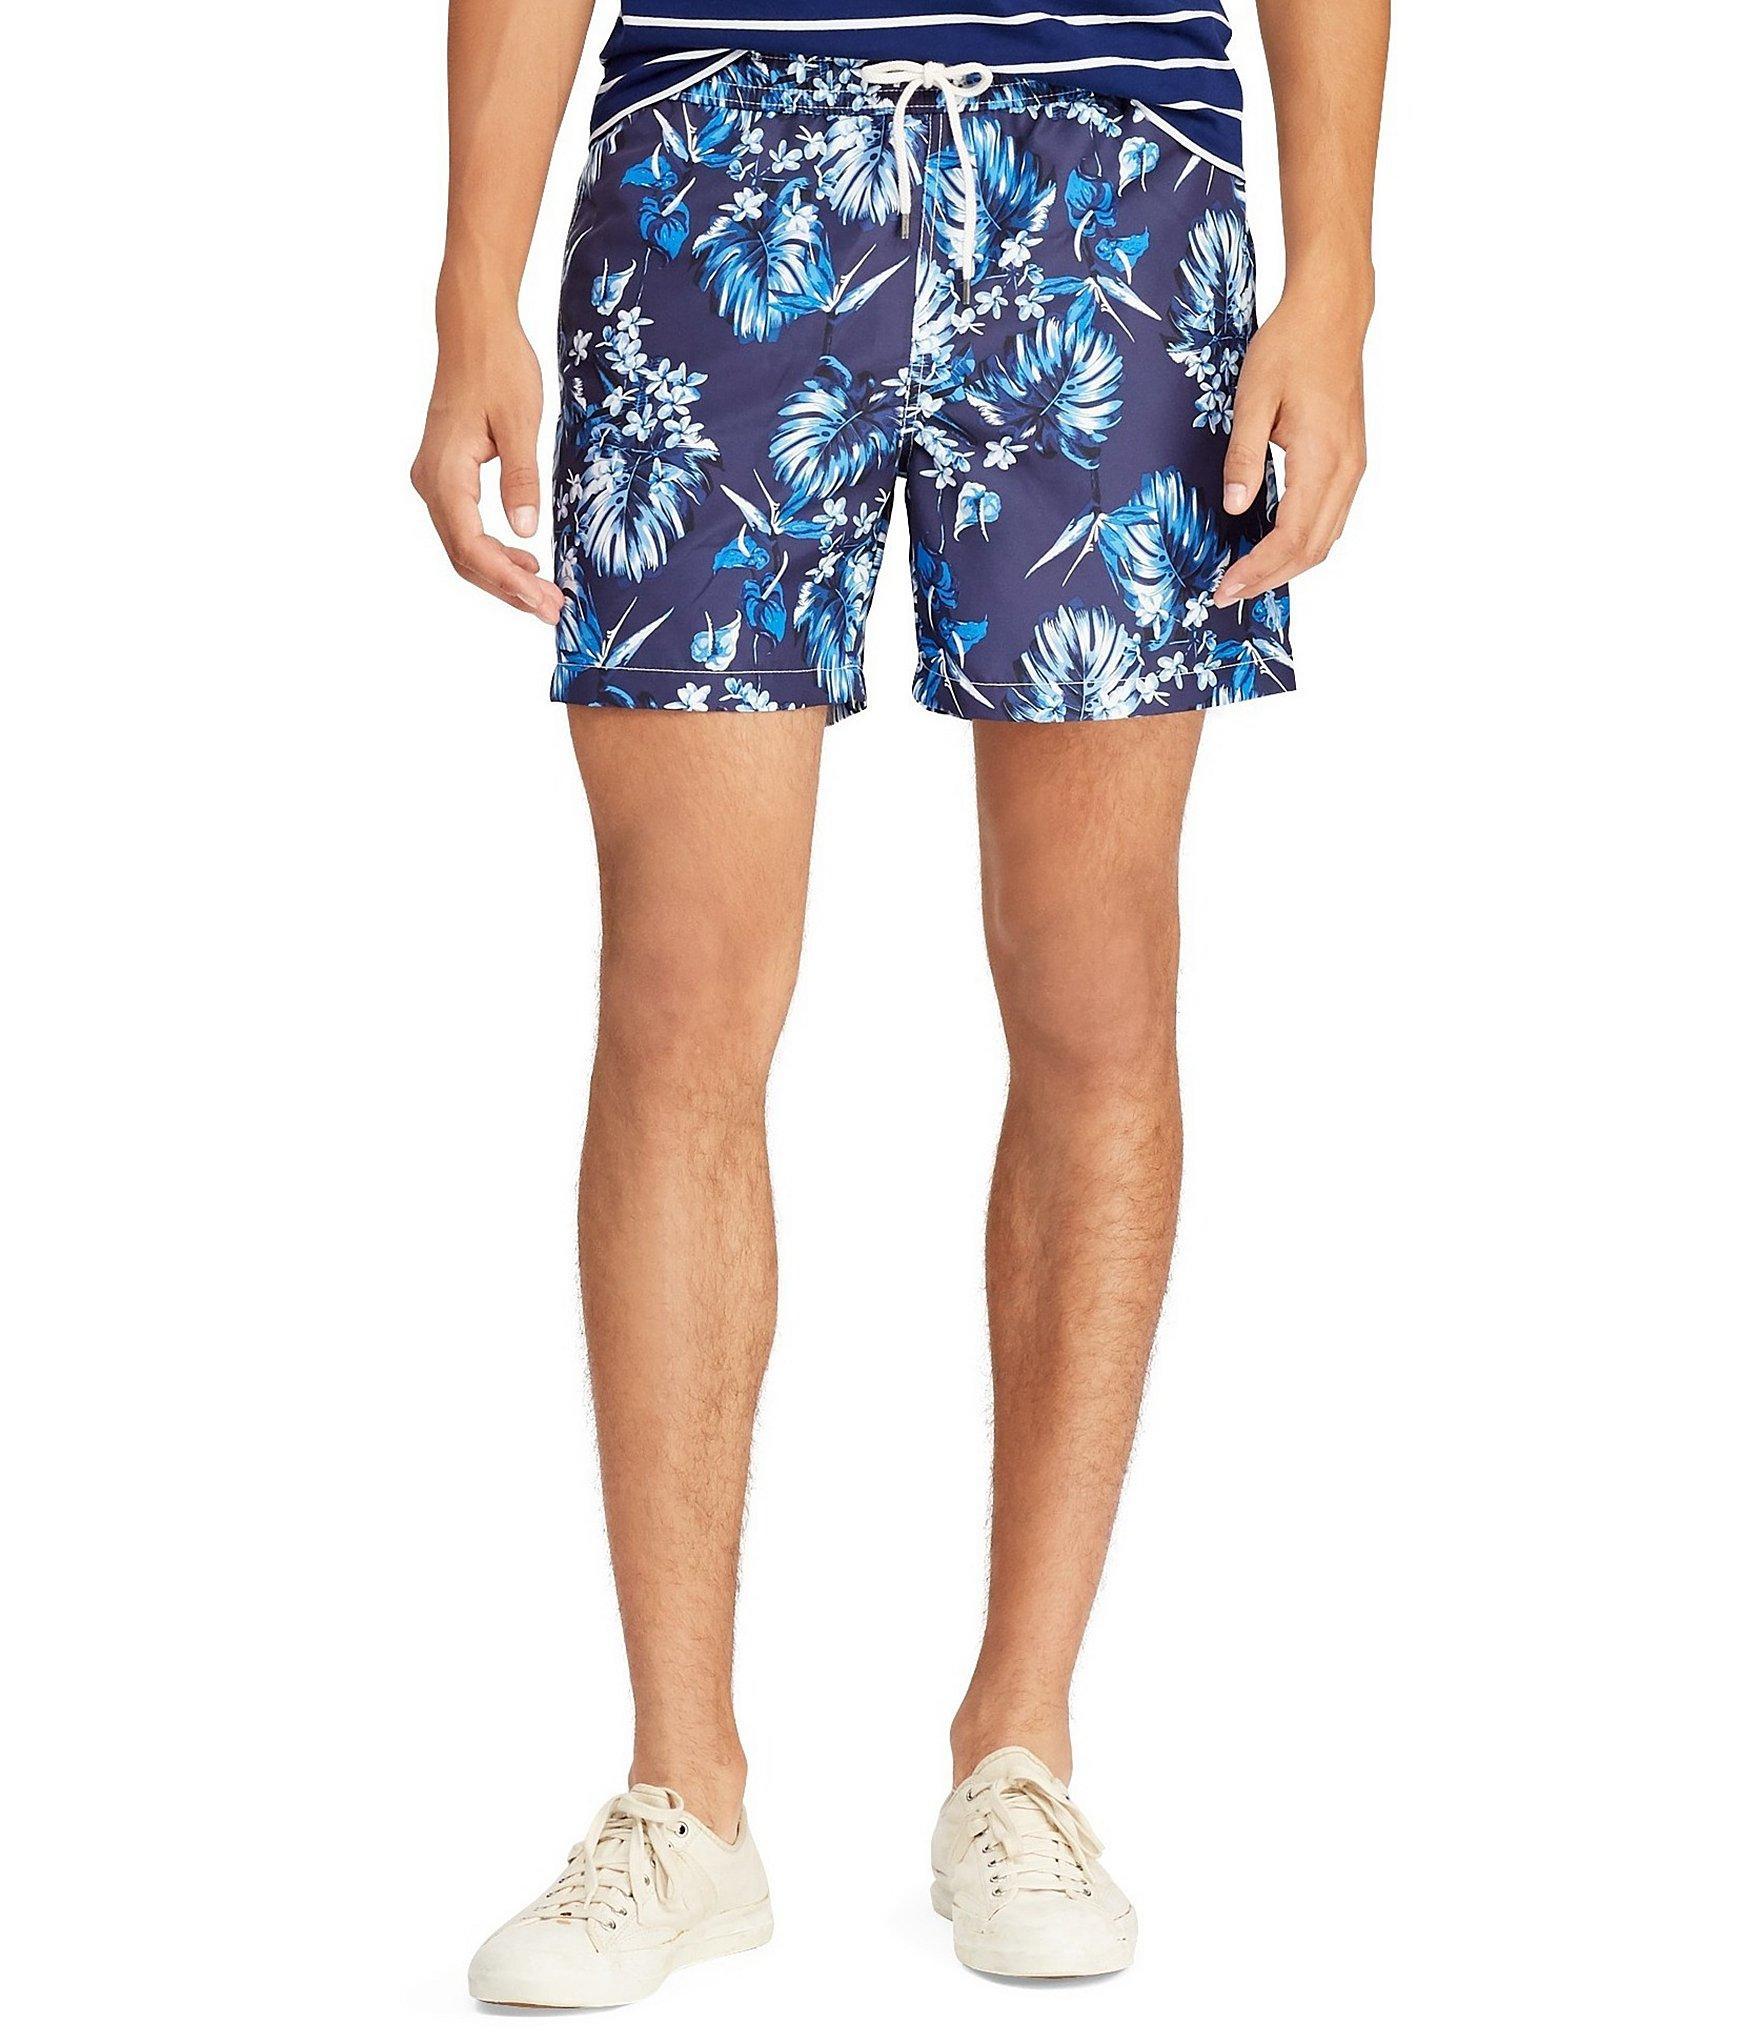 5d8a827428 Lyst - Polo Ralph Lauren 51⁄2-inch Traveler Swim Trunk in Blue for Men